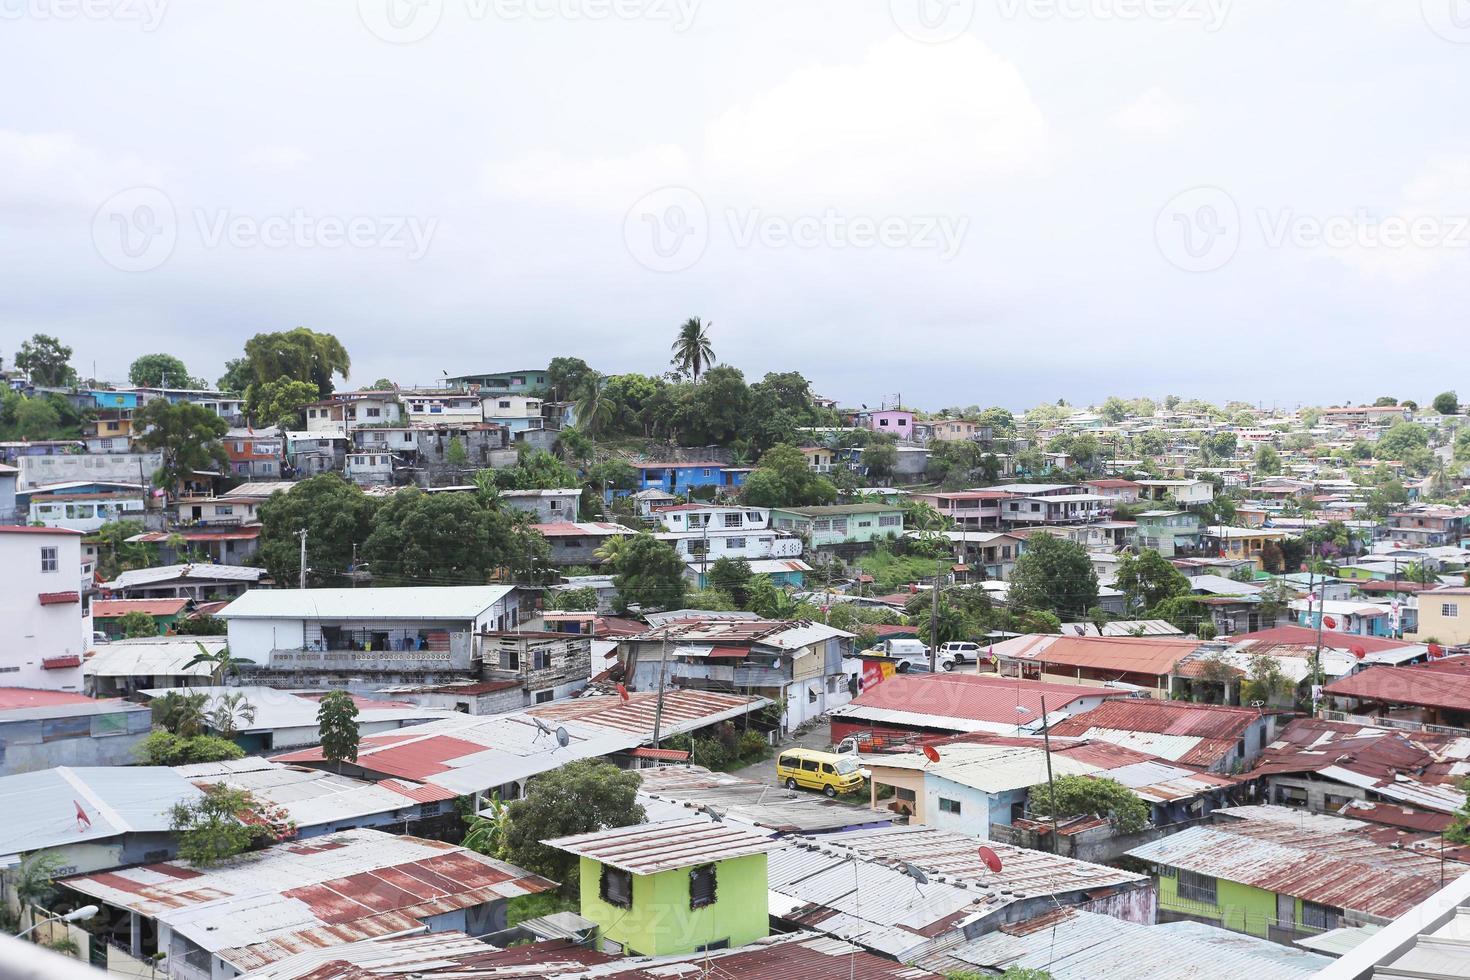 Flygfoto över shanty städer i Panama City foto